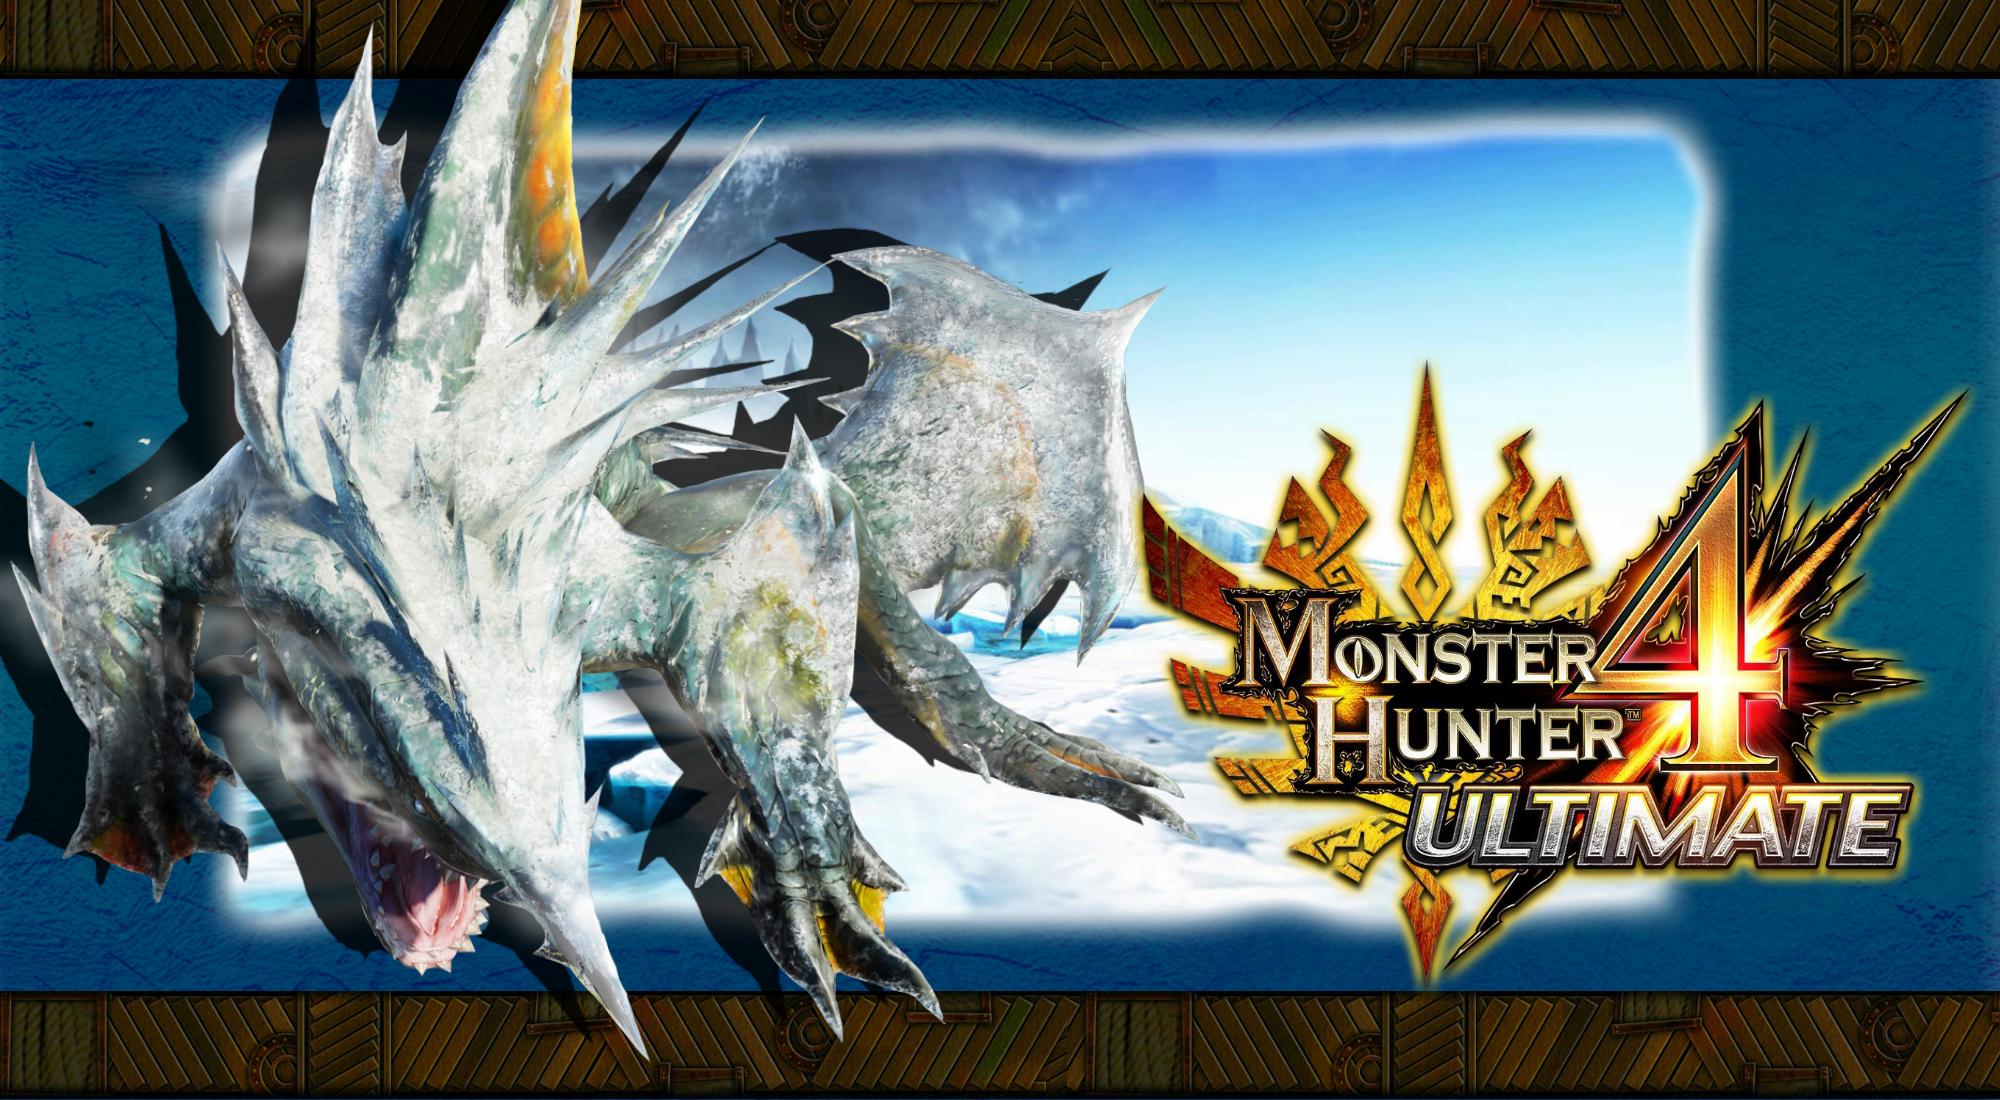 Monster Hunter 4 Ultimate   Zamtrios Wallpaper by DaKidGaming on 2000x1100